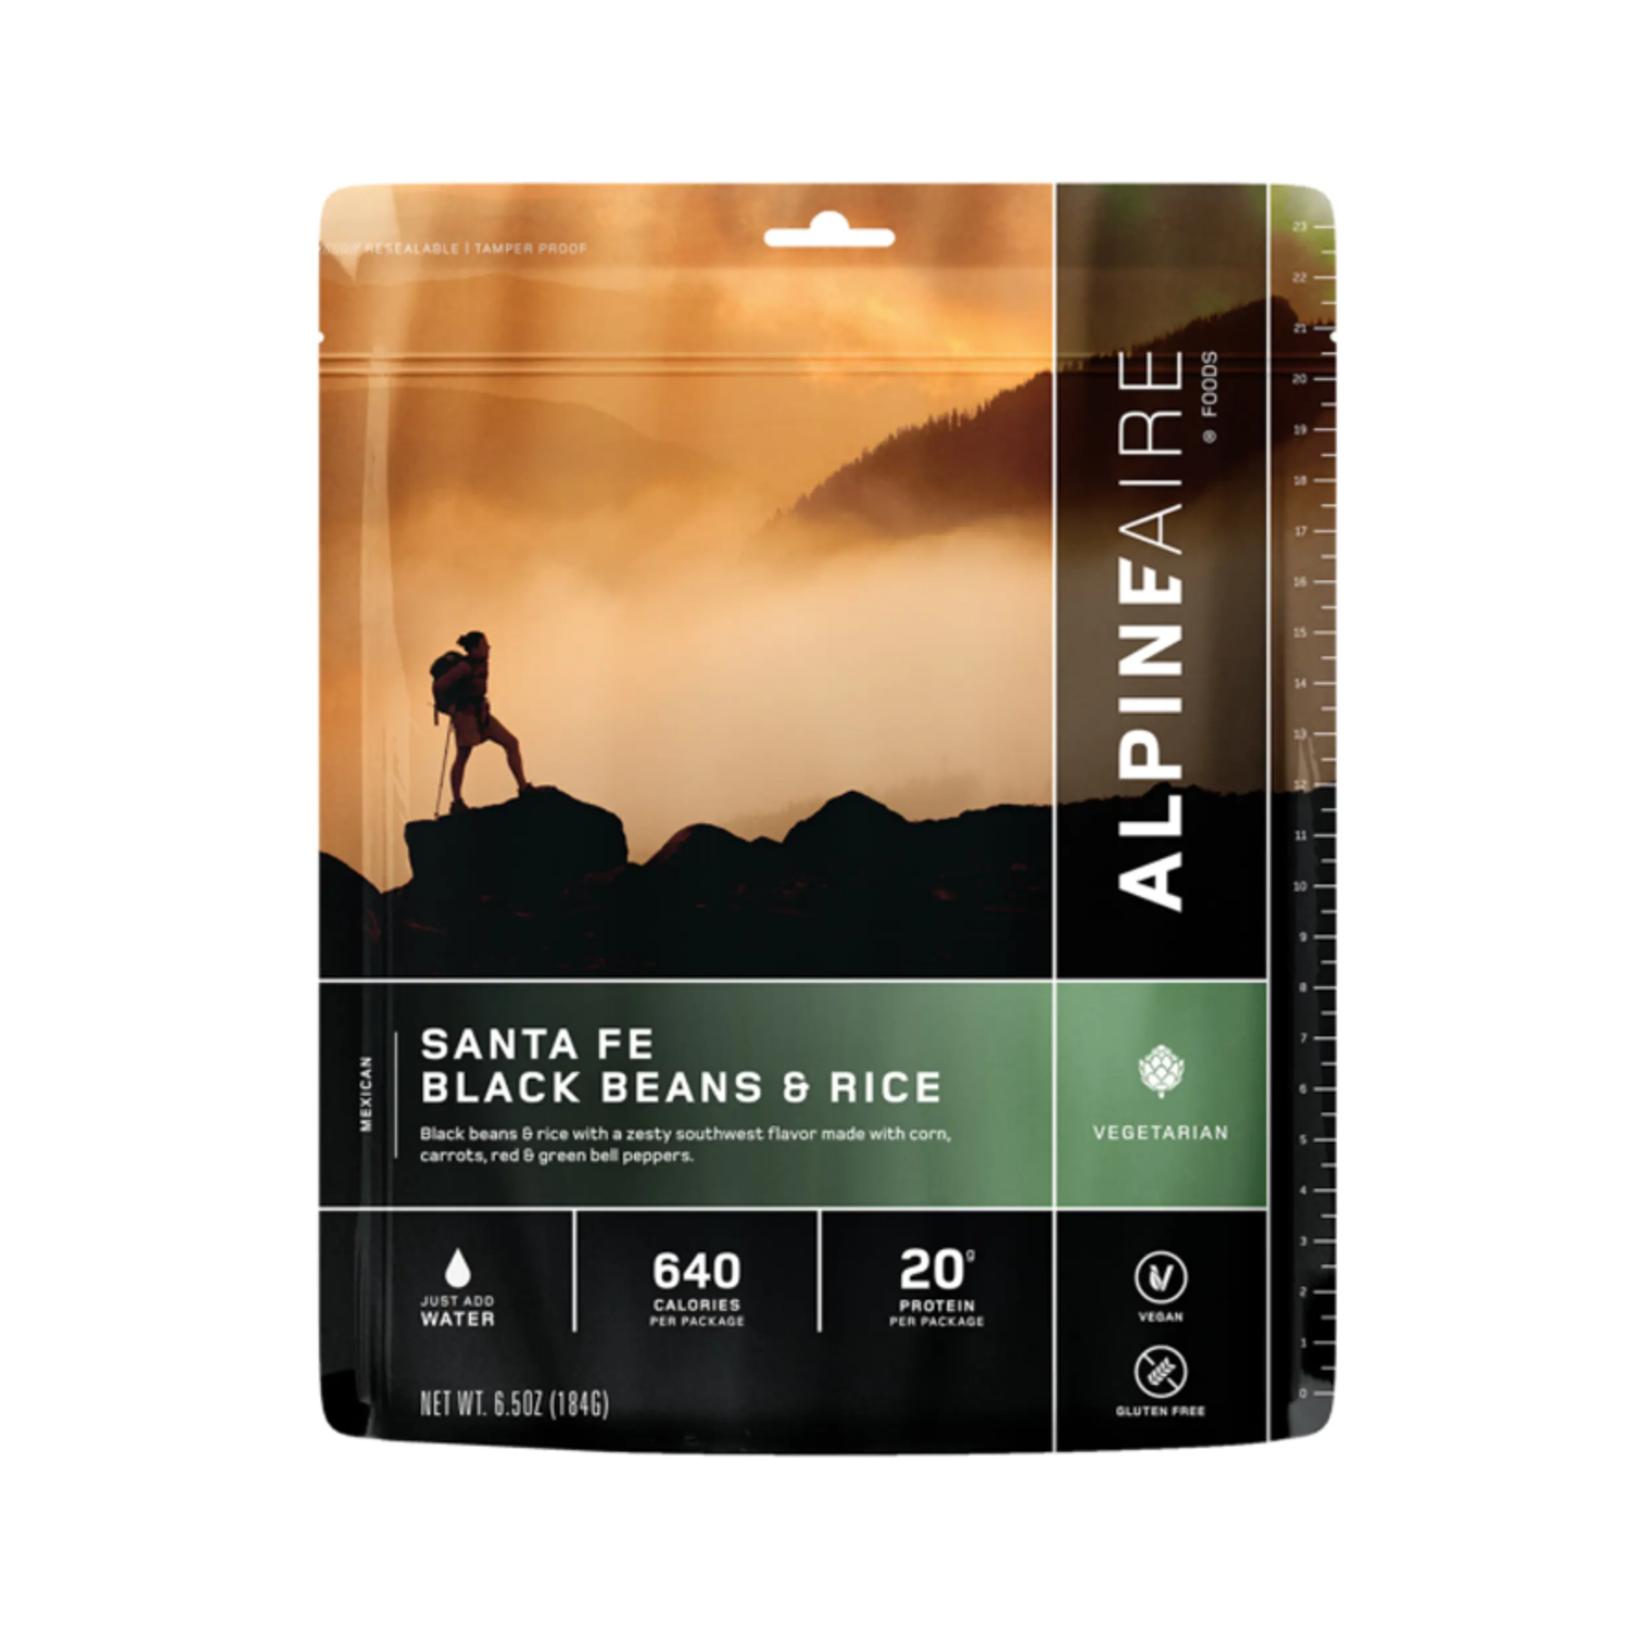 ALPINEAIRE Santa Fe Black Beans & Rice